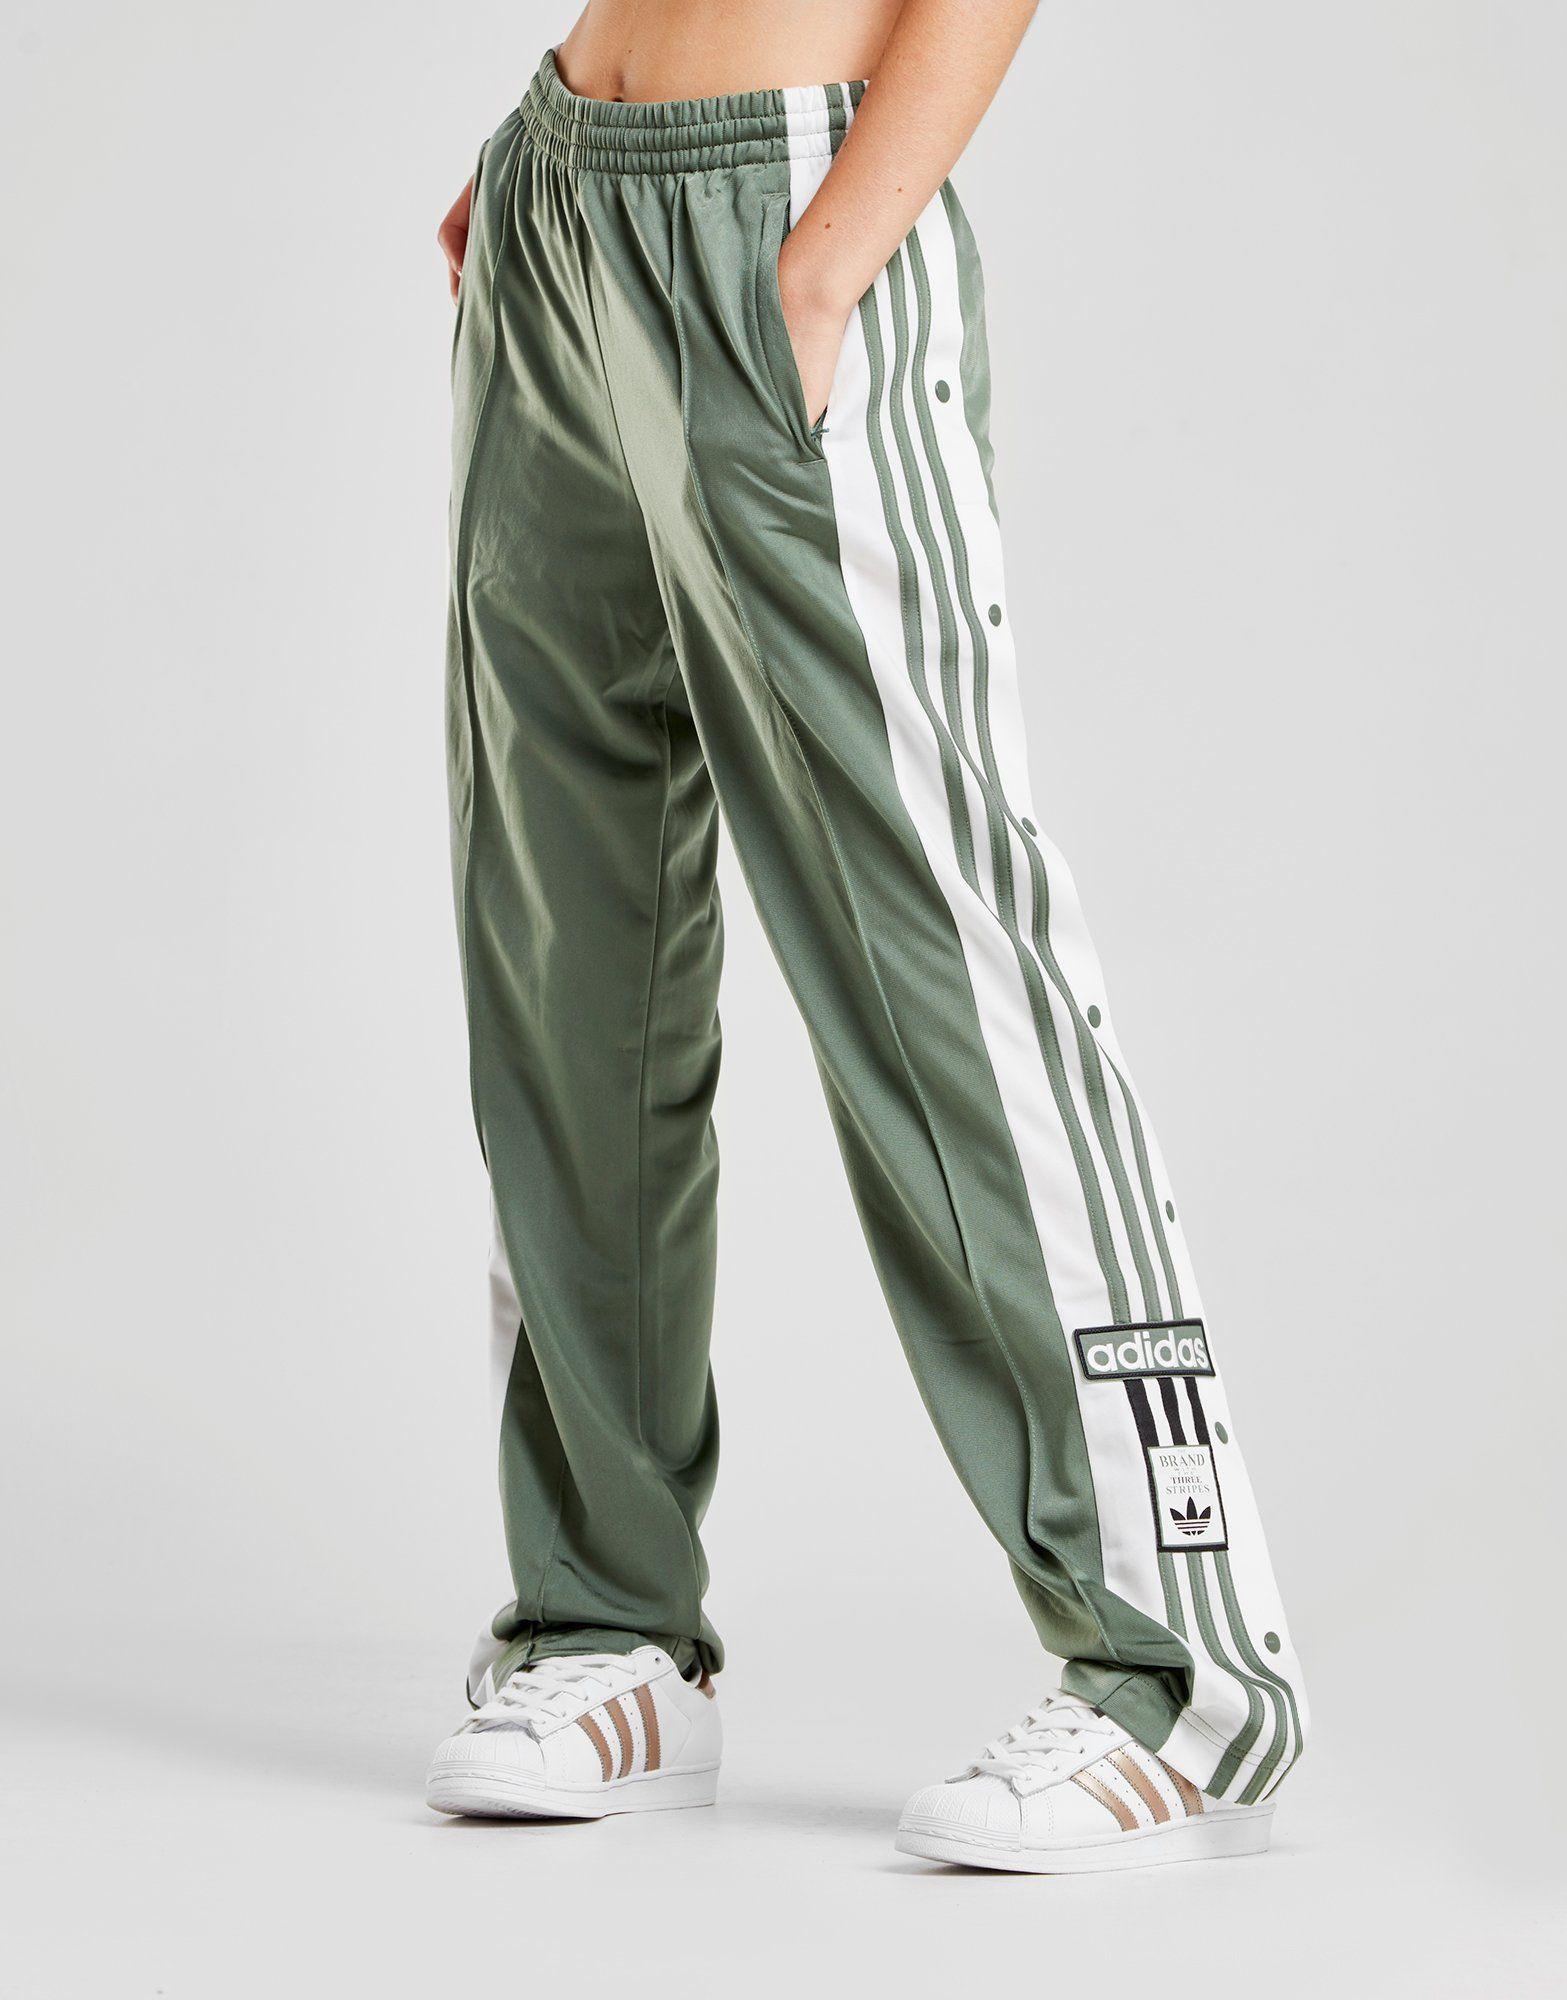 adidas Originals pantalón de chándal Adibreak Popper ...